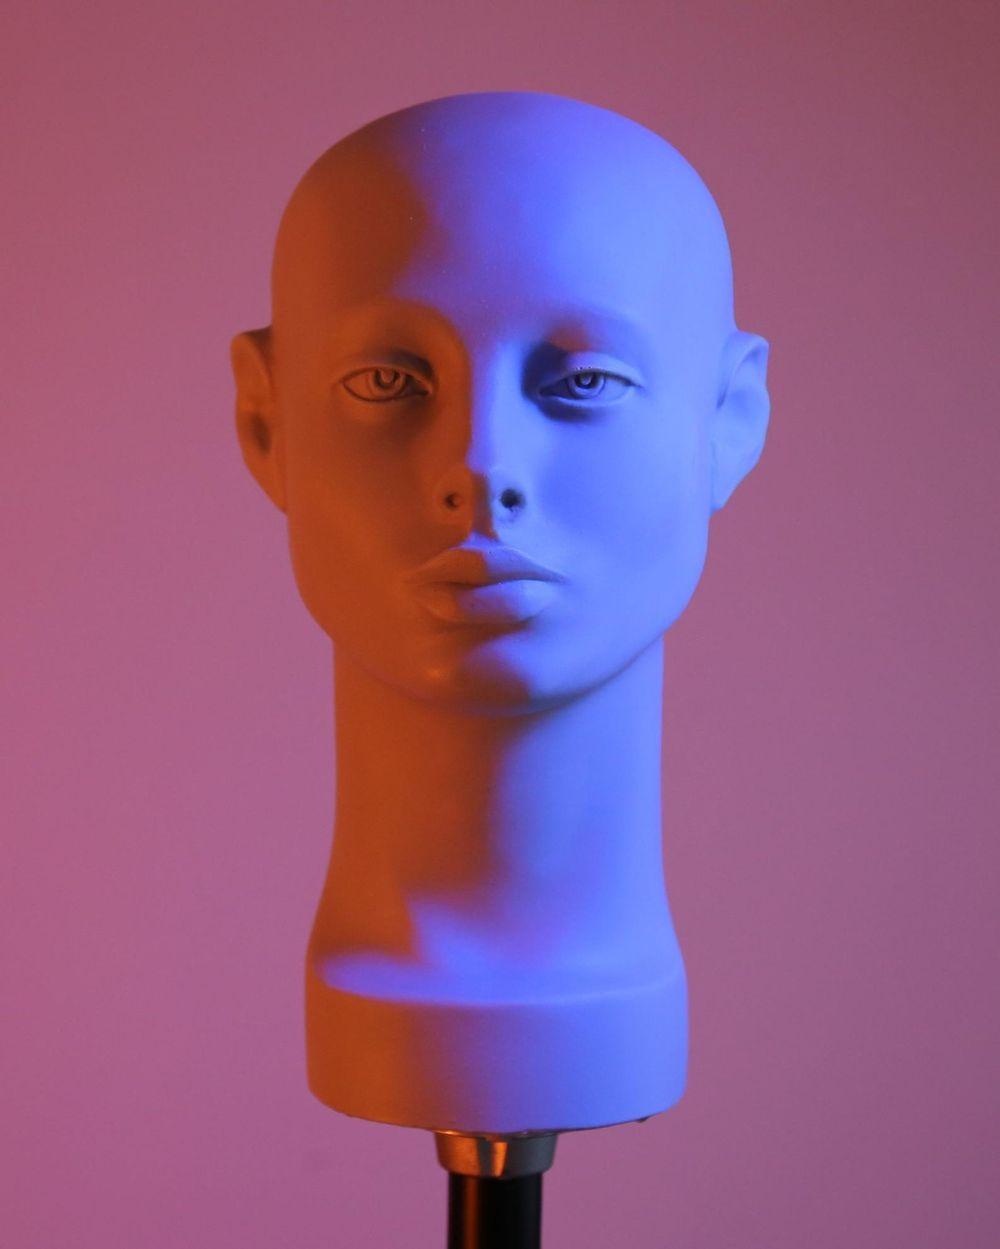 Light & Colour Study - image 2 - student project